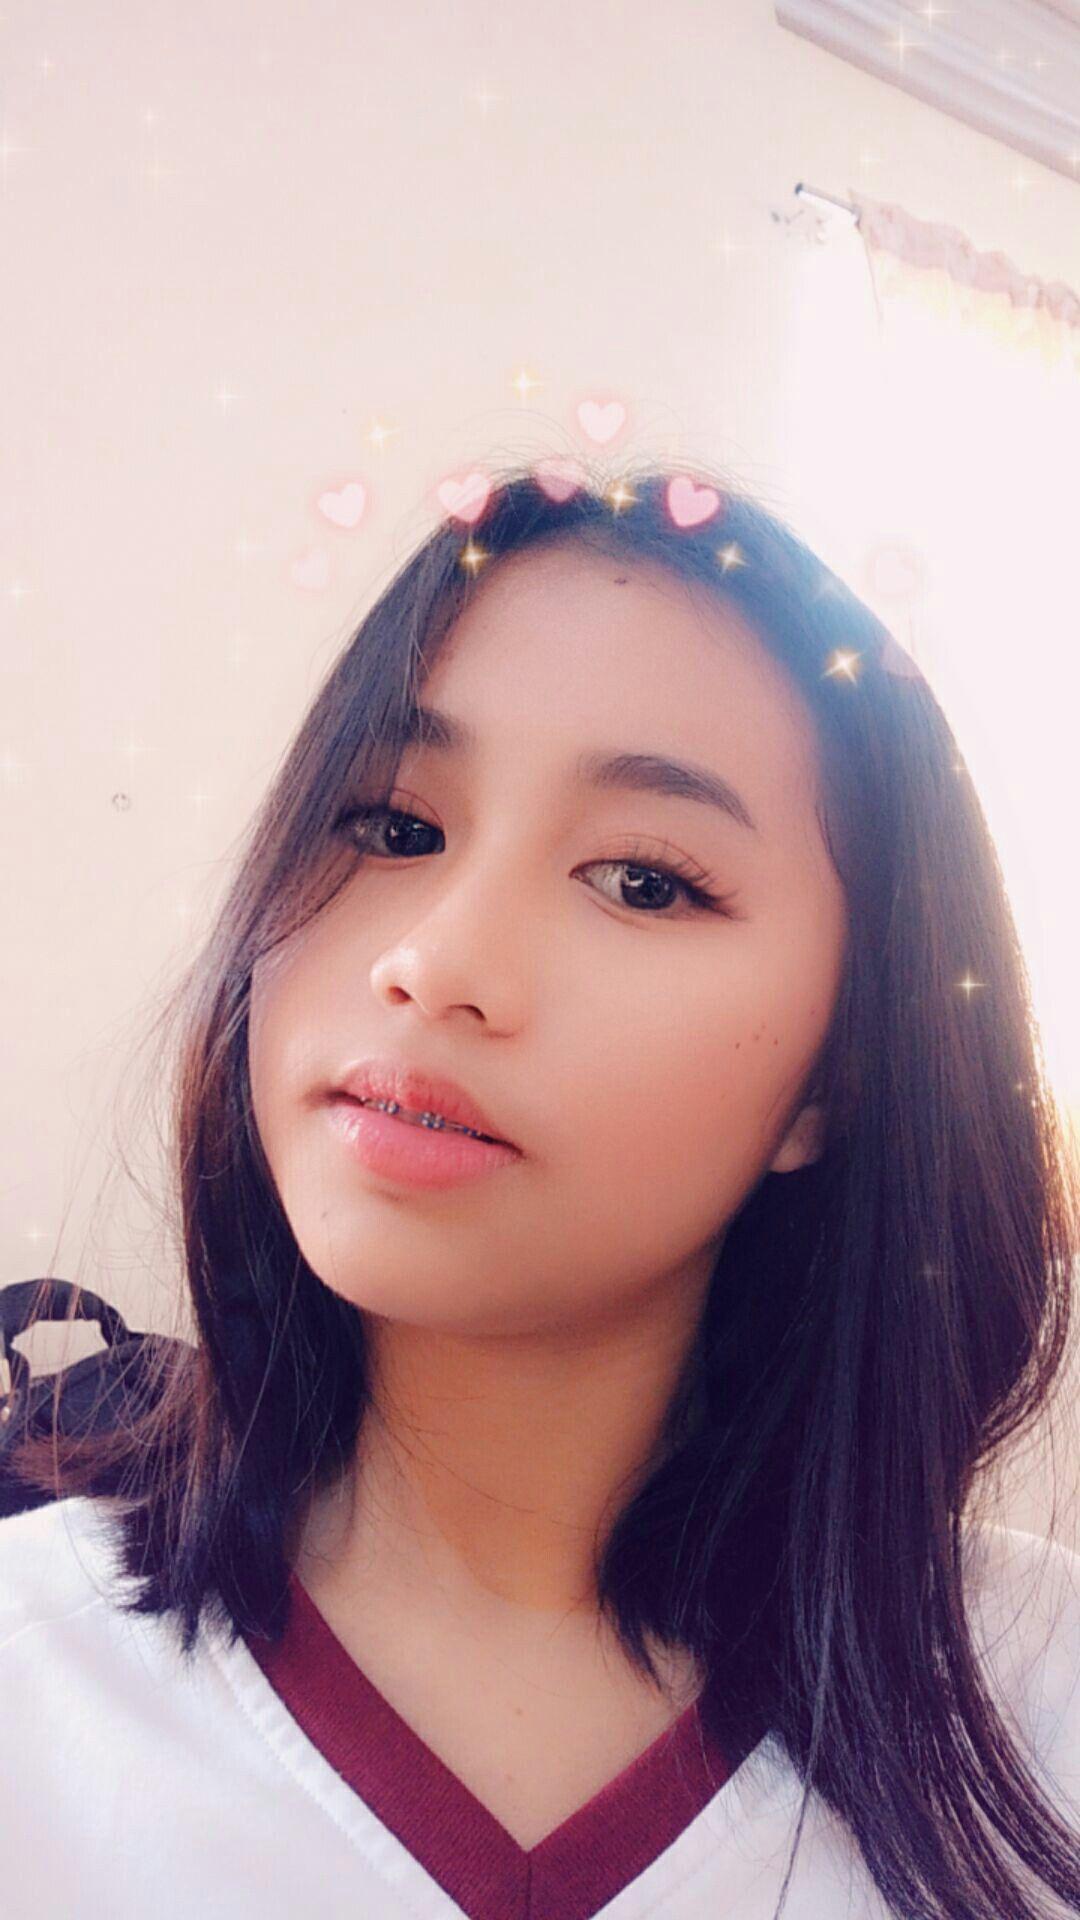 IG: trlb_dannn #ullzang #girl #gorgeous #filipina #STAY